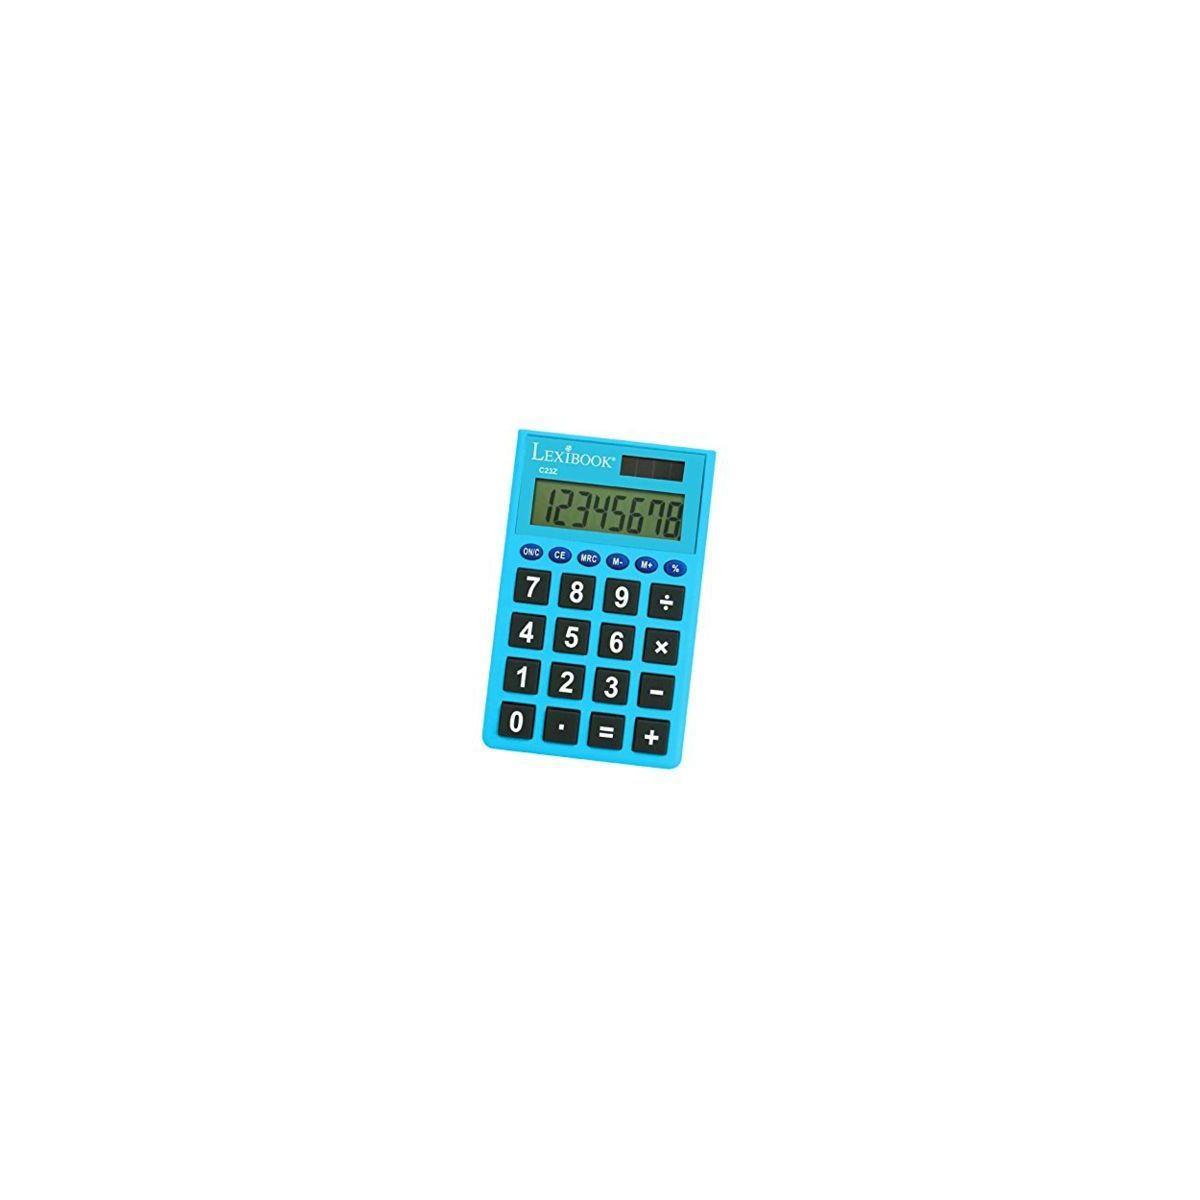 Calculatrice standard lexibook calculatrice de poche 8 chiffres-assorti - 2% de remise imm�diate avec le code : deal2 (photo)